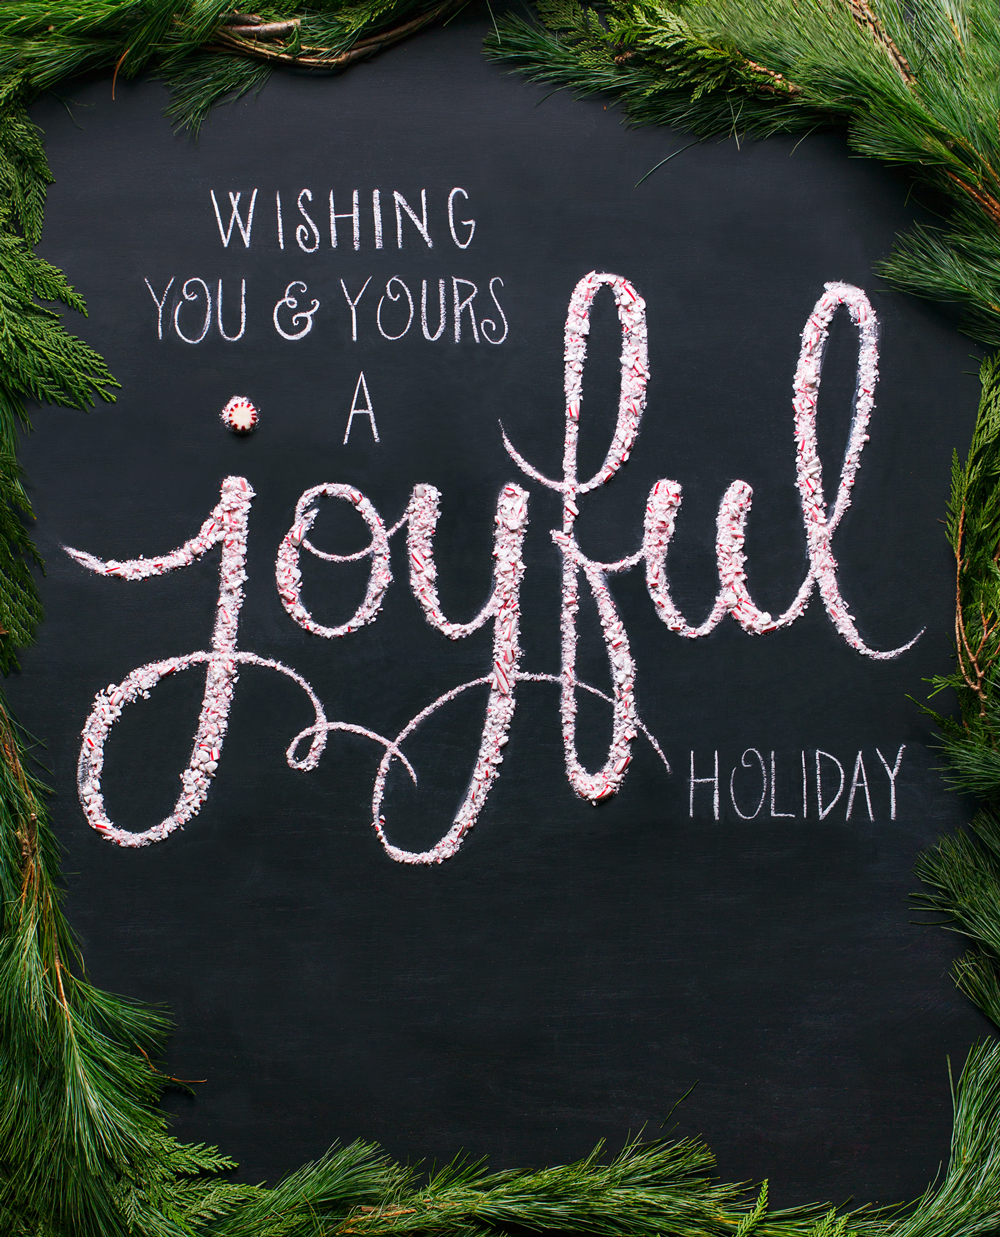 joyful_holiday_1000px.jpg